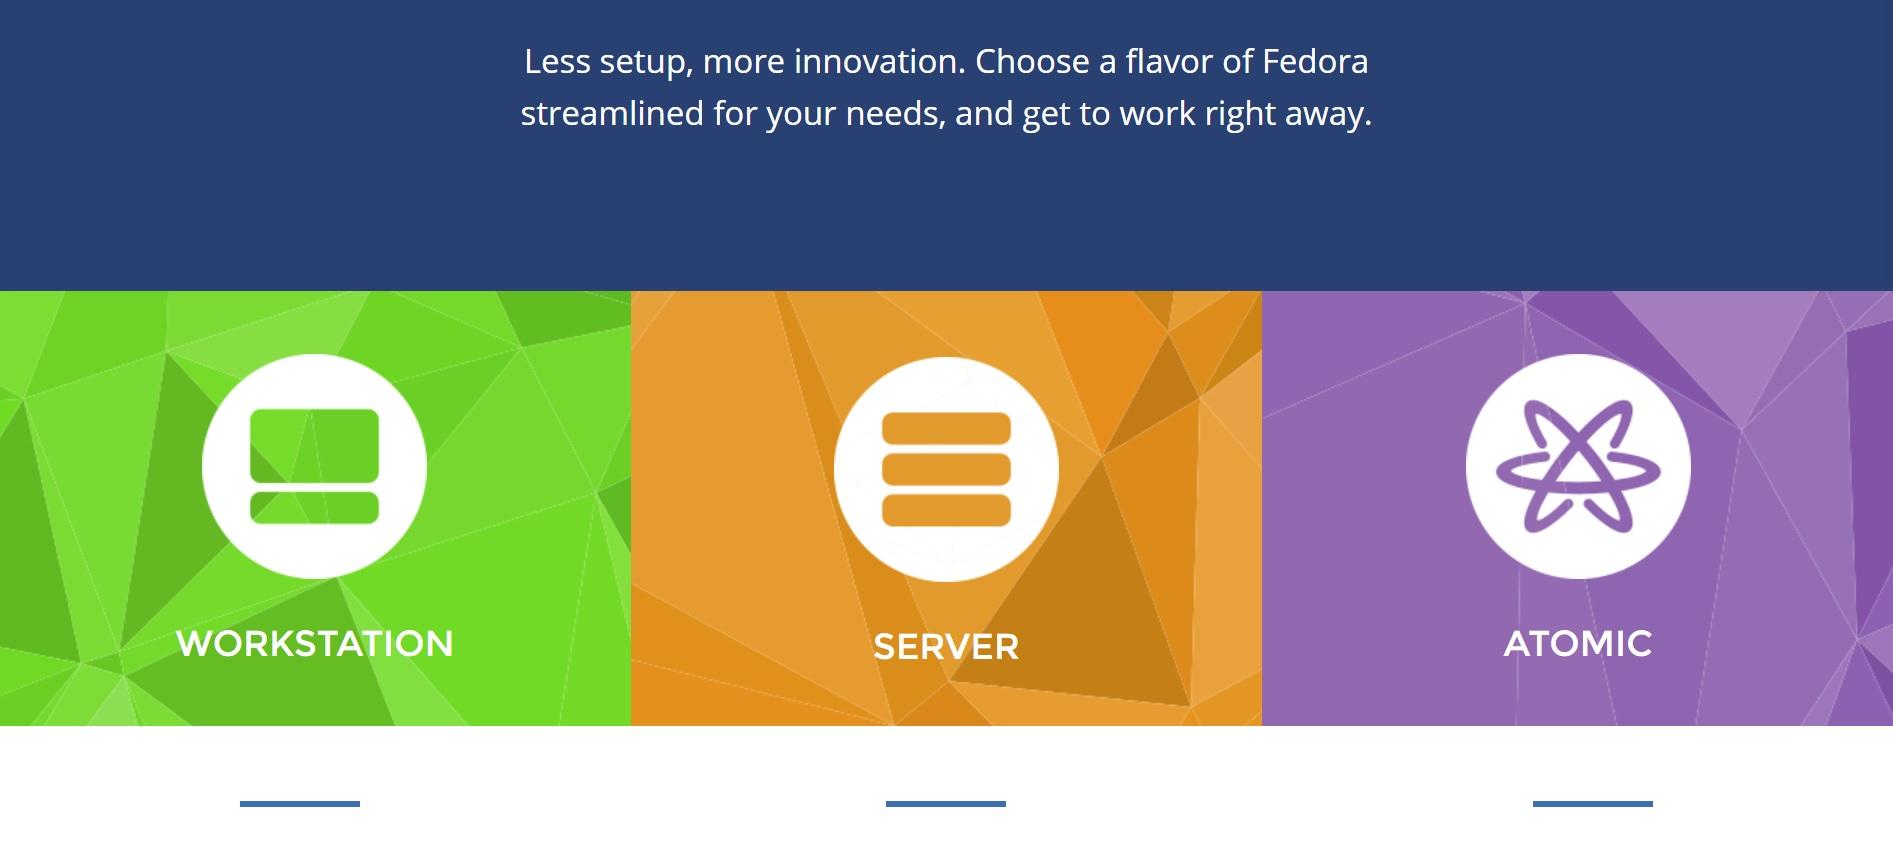 Fedora editions